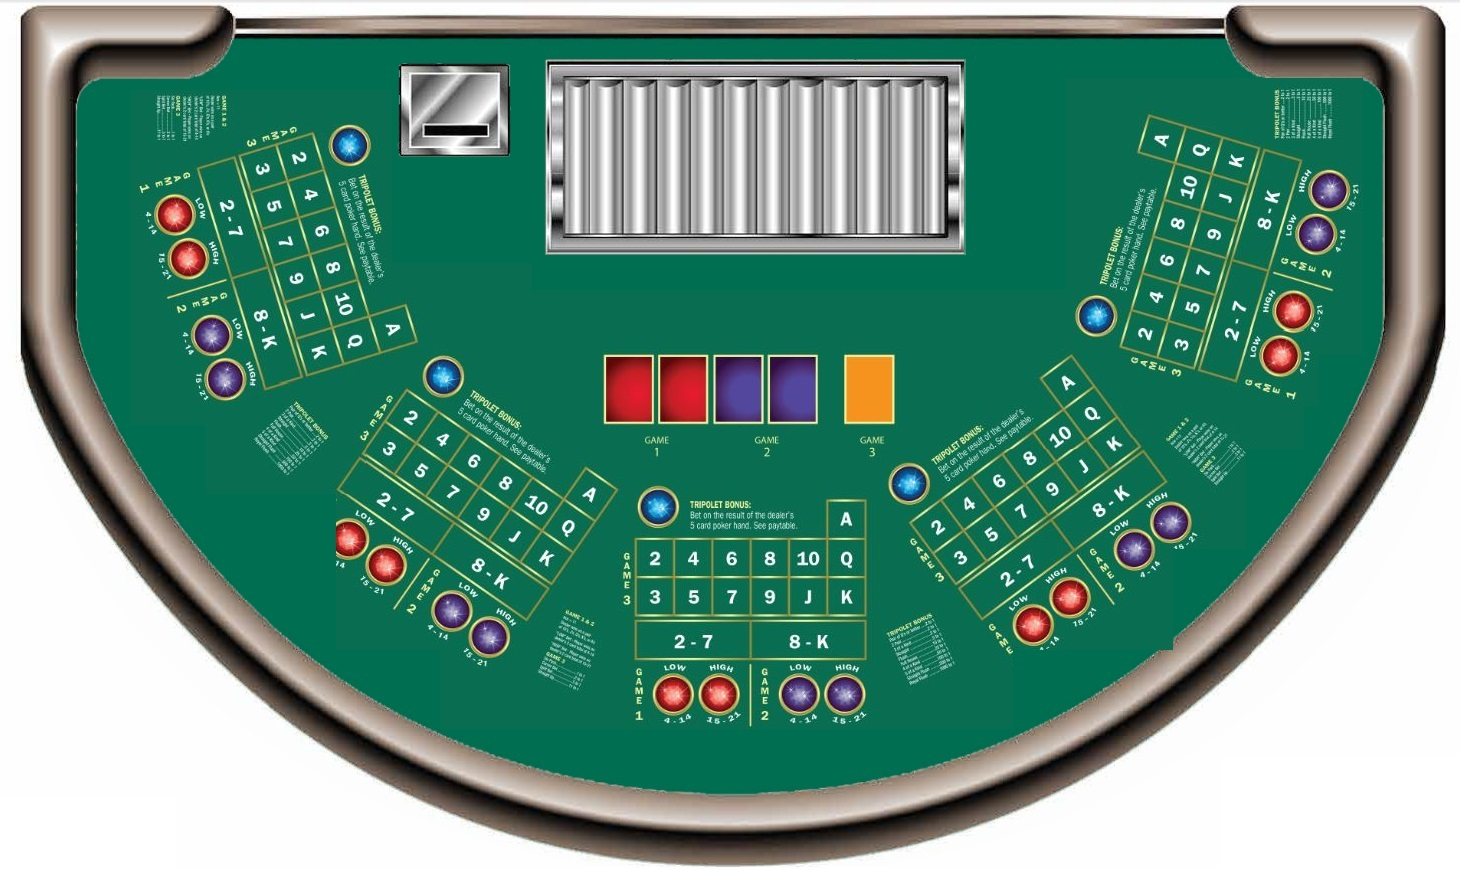 card board gambling games certified